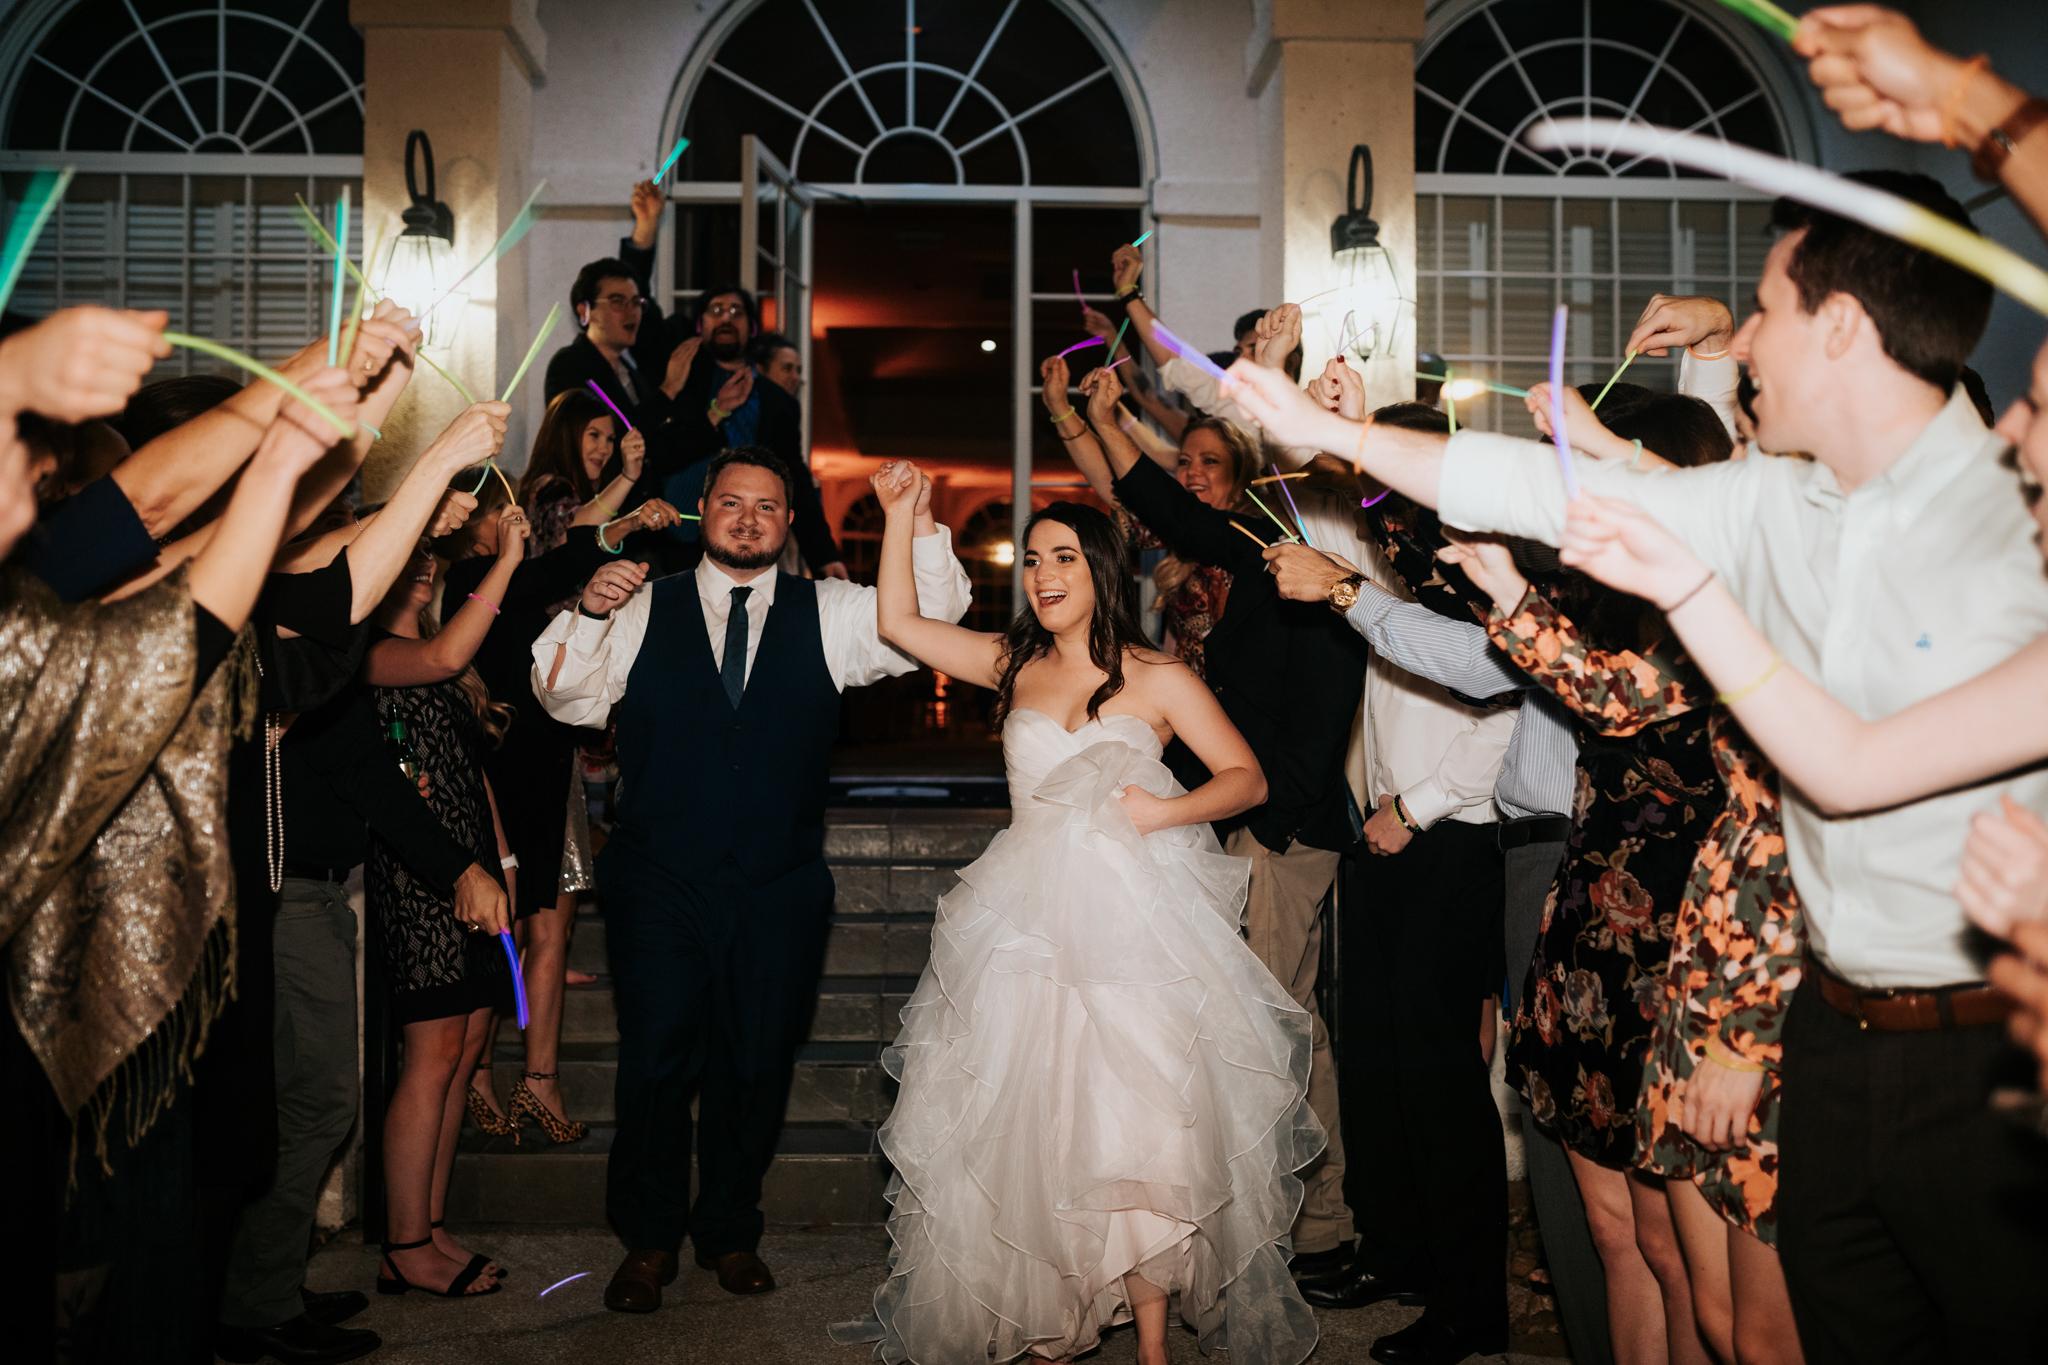 Leah Nicole Photography - Houston Wedding Photographer-Lake Conroe Wedding- Houston Wedding Photographer-57.jpg